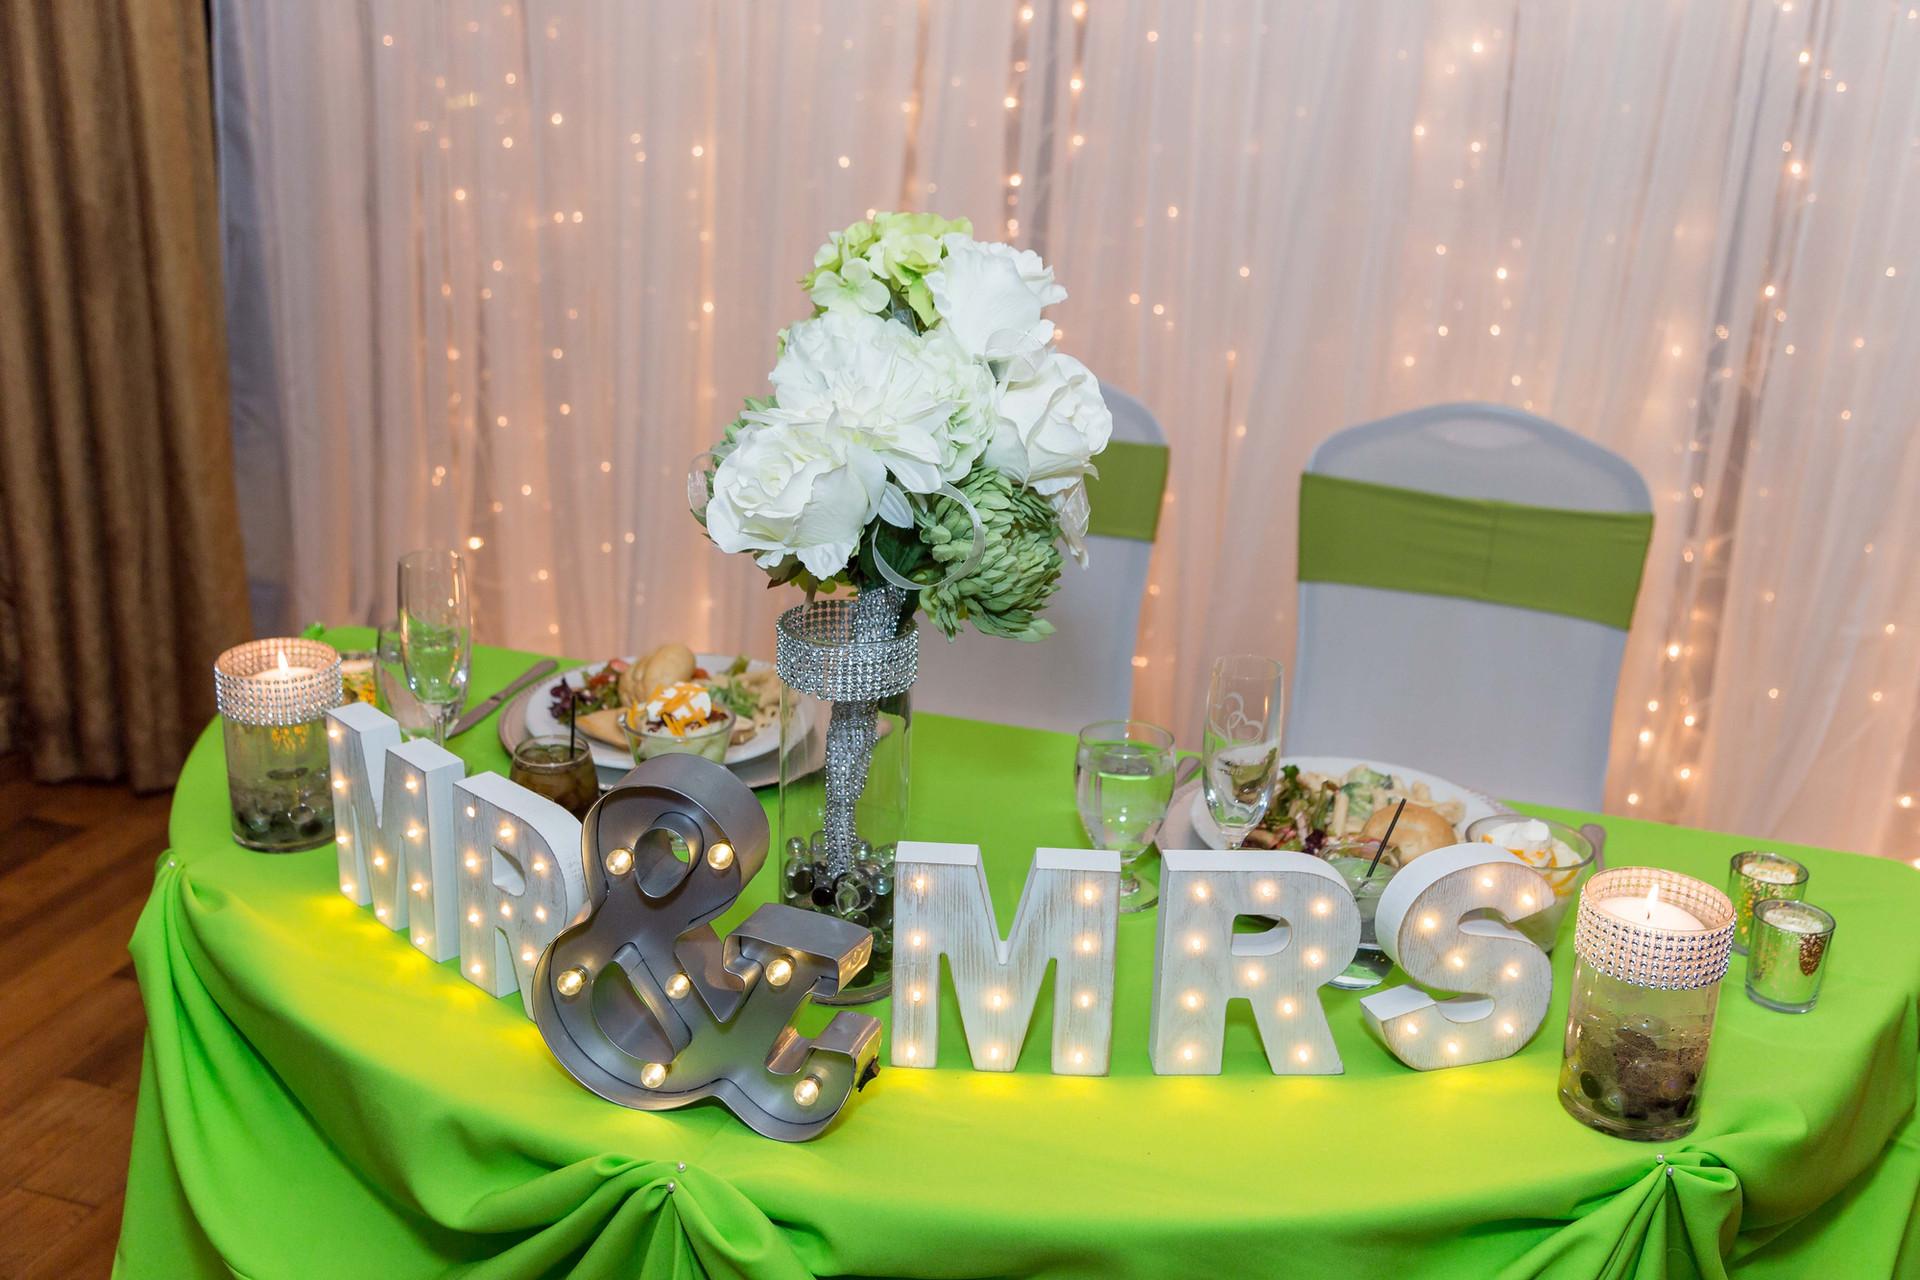 Wedding Couple Centerpiece